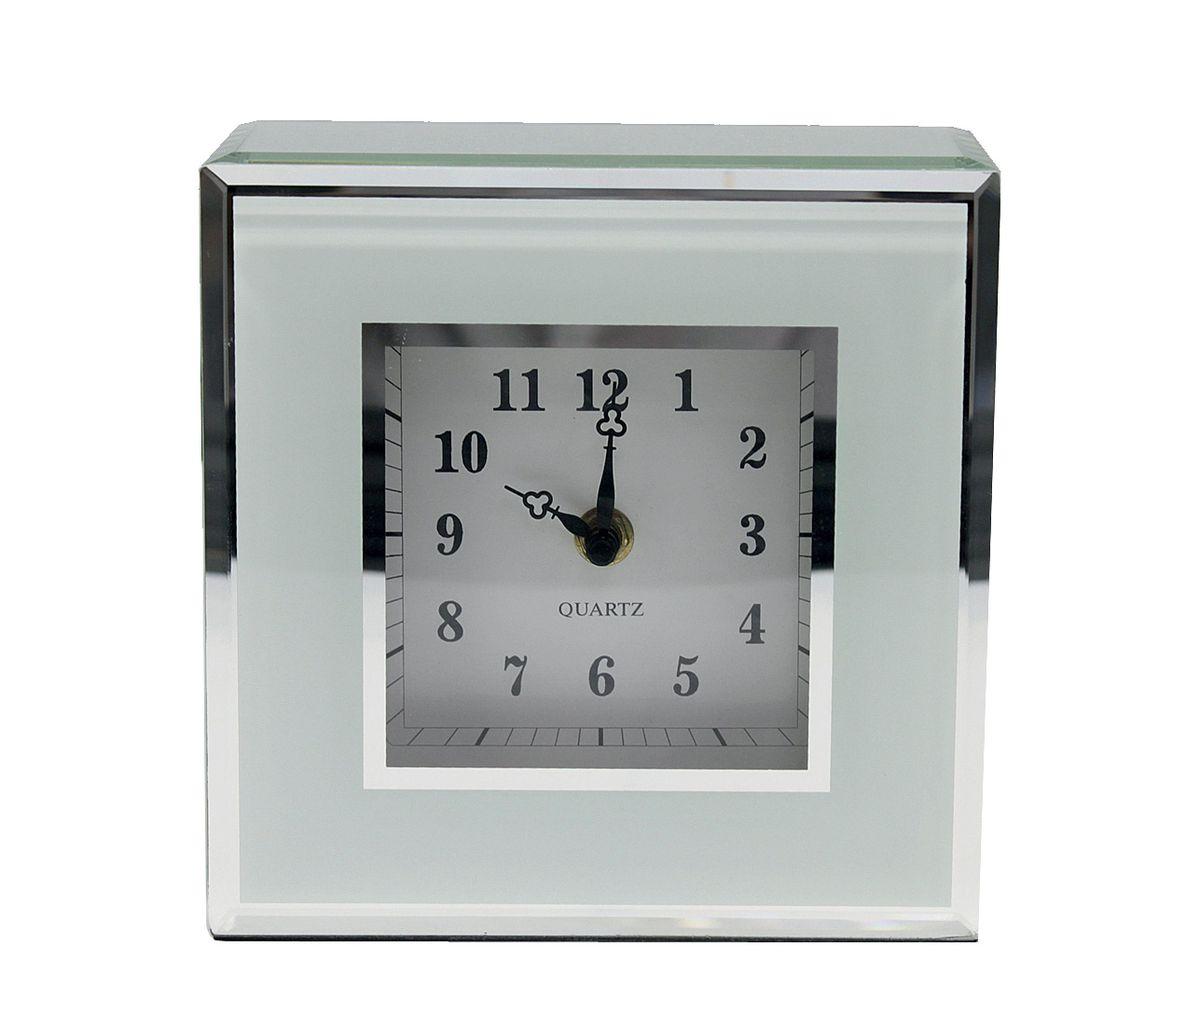 Часы настенные Jardin dEte Инь-Ян, цвет: белый, 17,5 х 17,5 смHS-25773Acталь, стекло